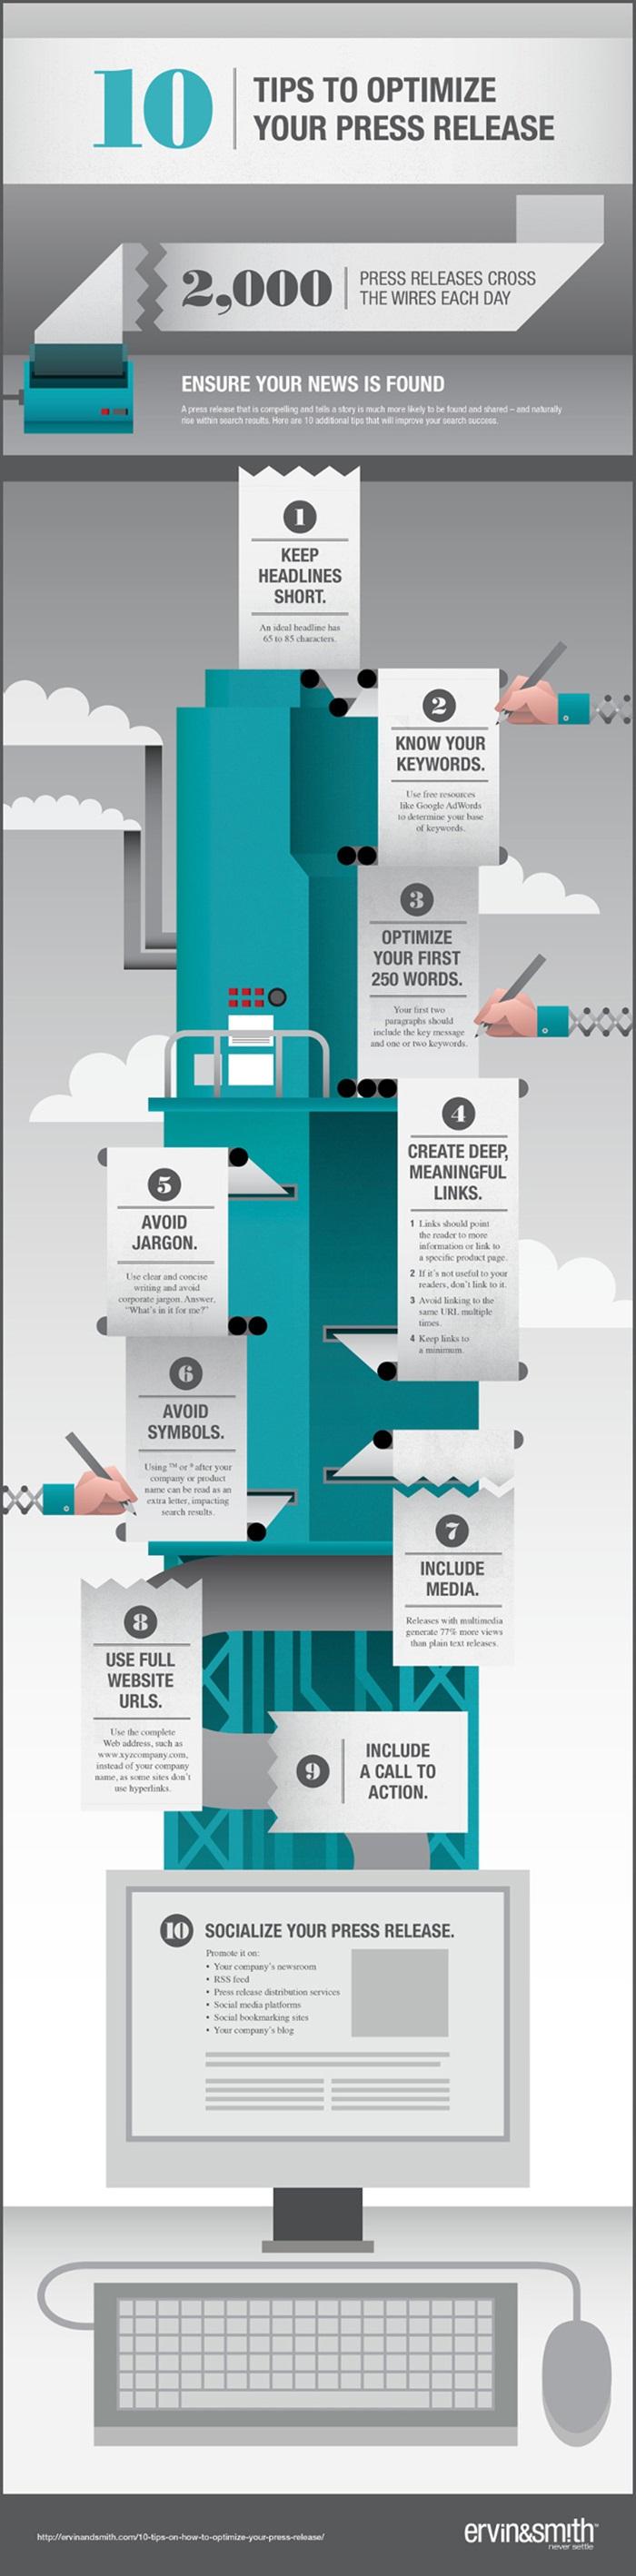 Infographic_OptimizePR